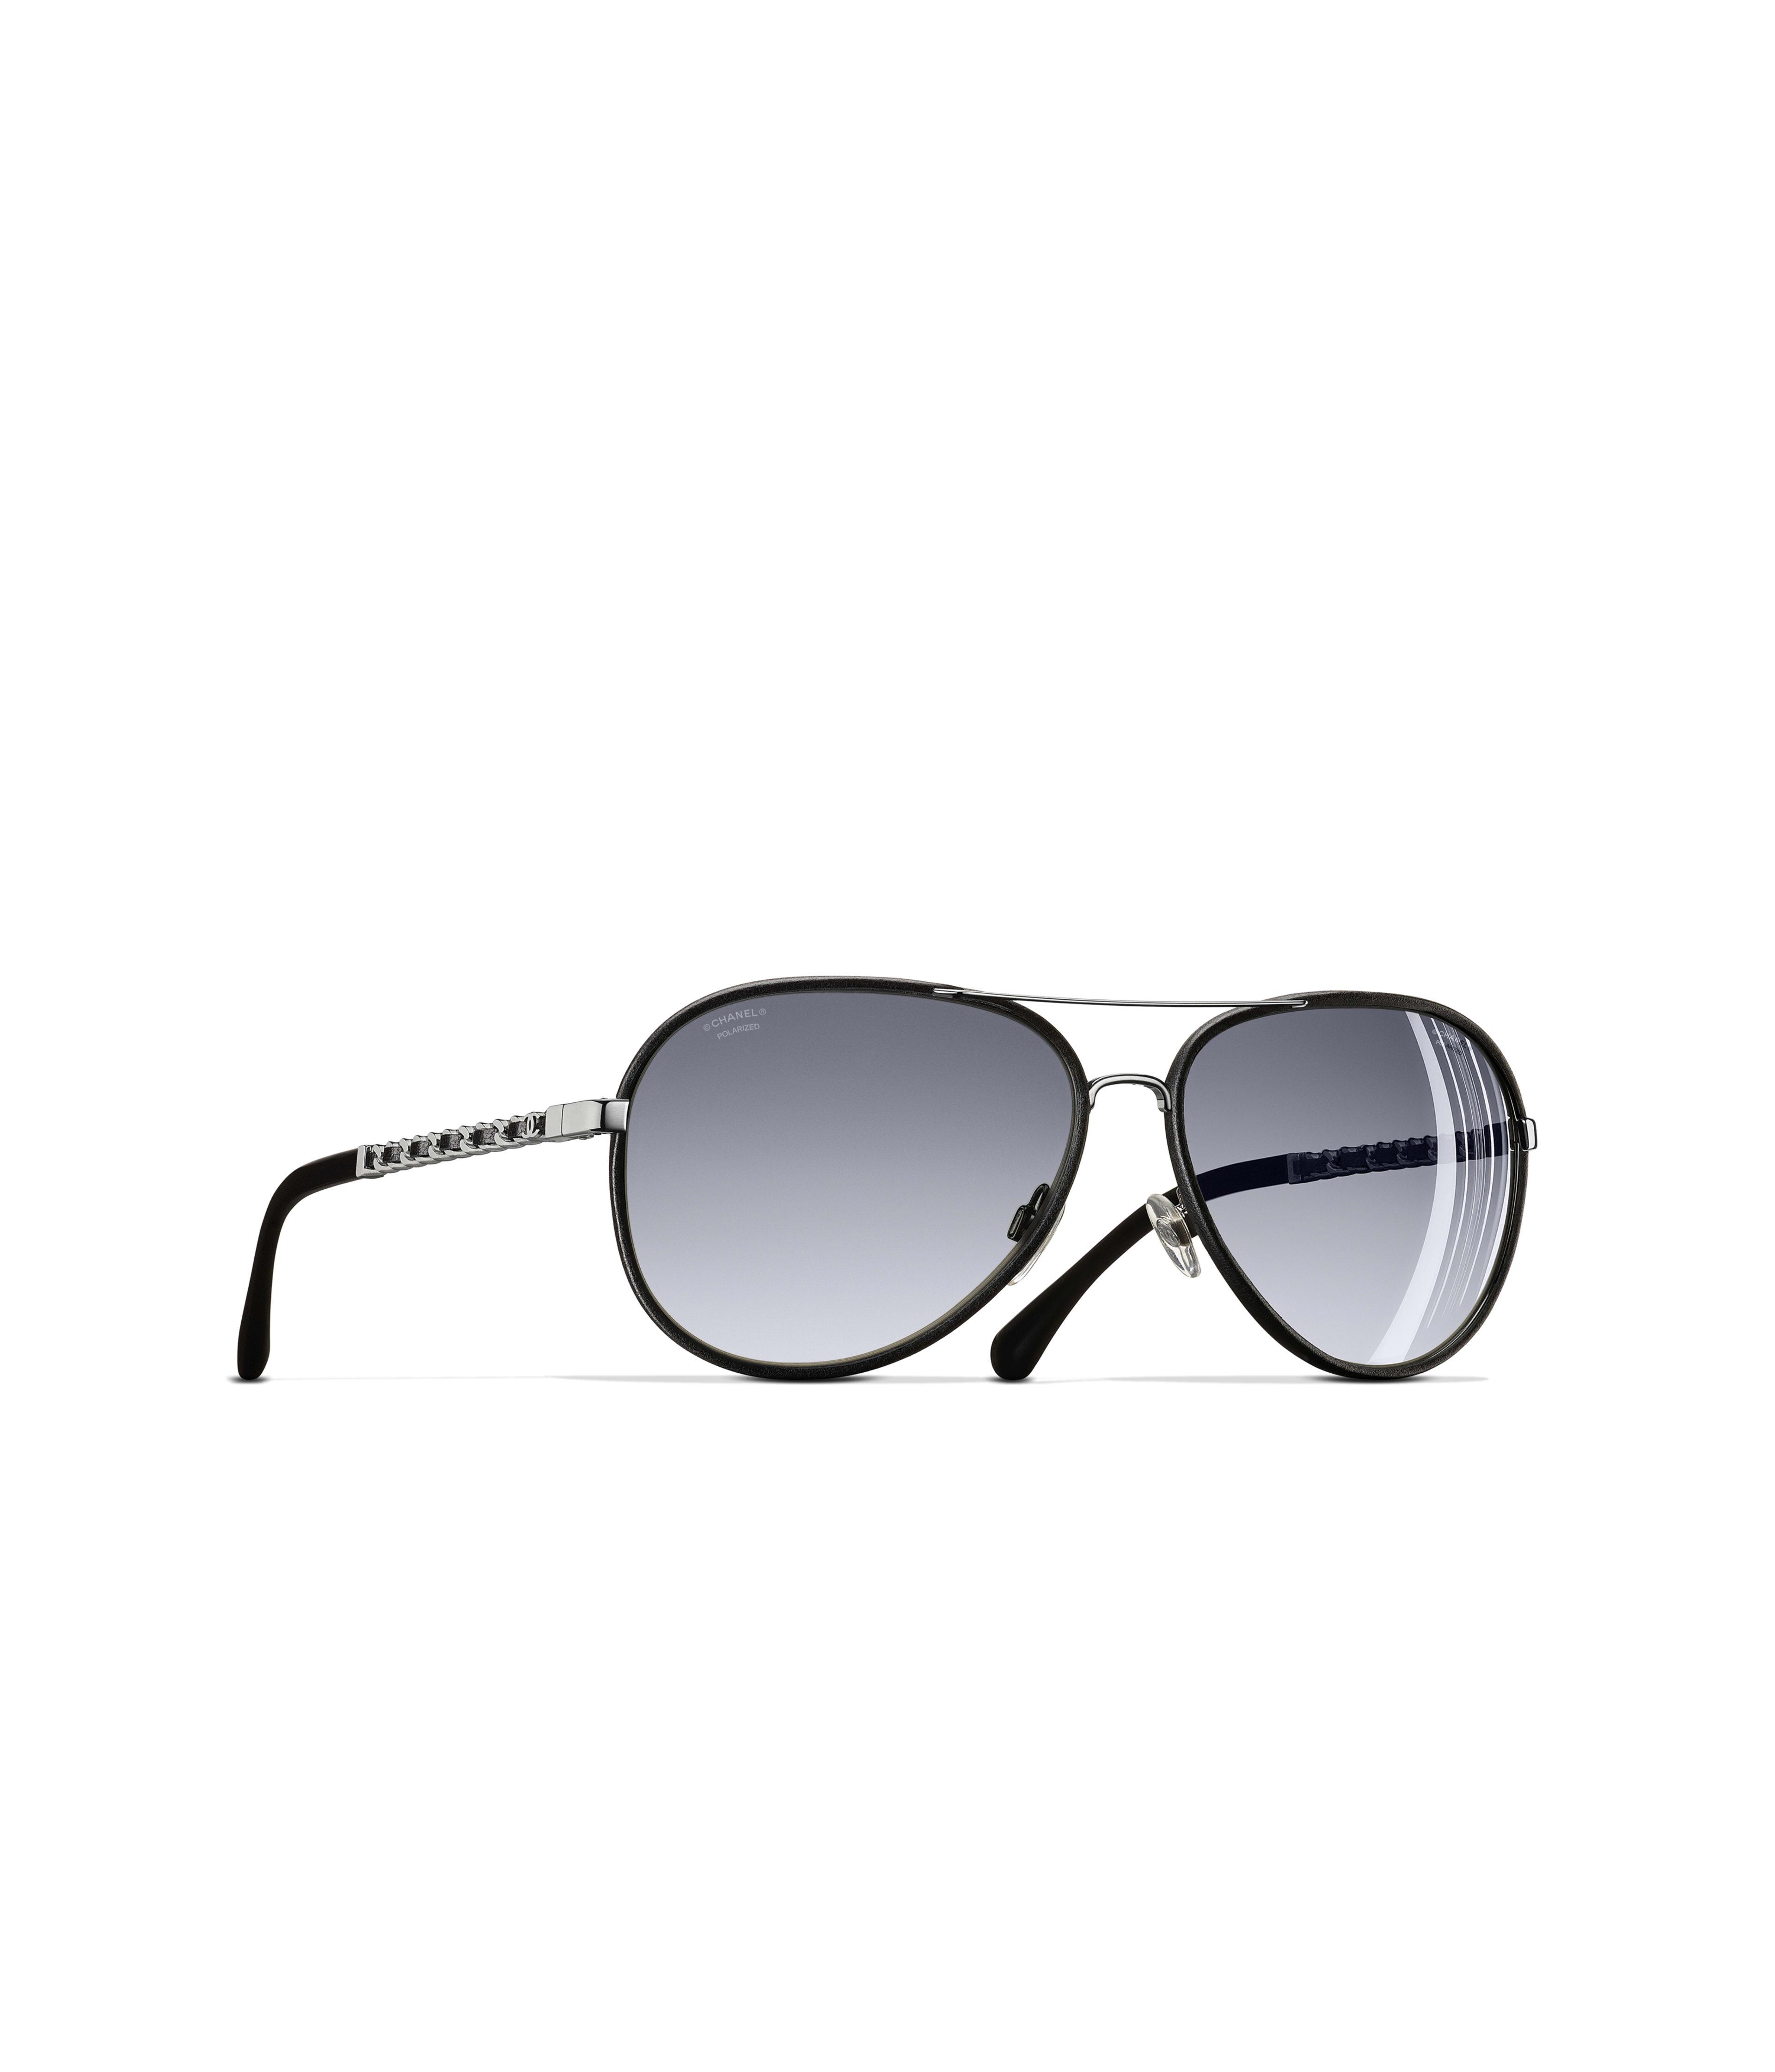 edfea8dc84a Pilot Sunglasses Ref. 4219Q C108S8